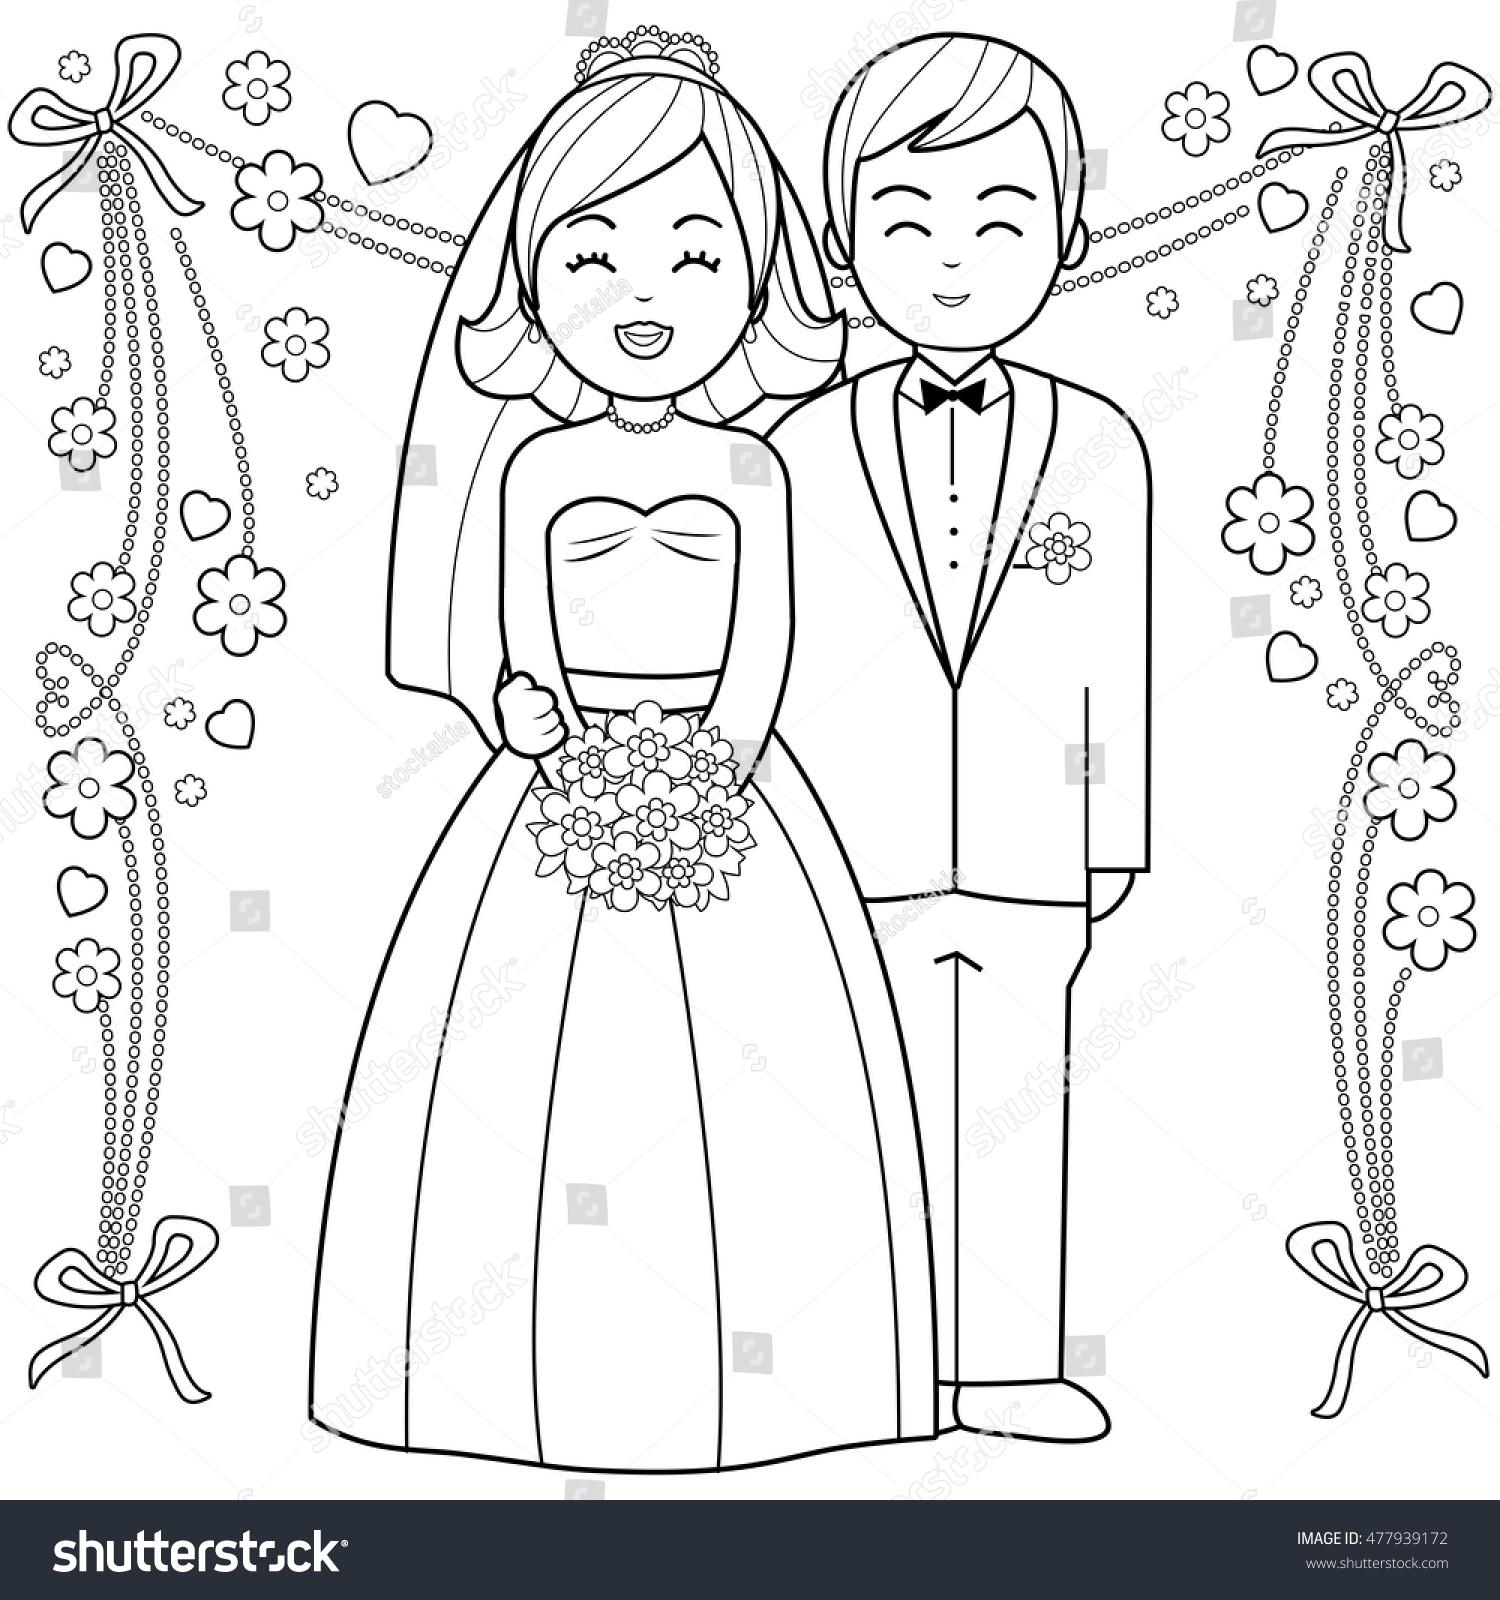 Bride Groom Coloring Book Page Stock Vector 477939172 - Shutterstock